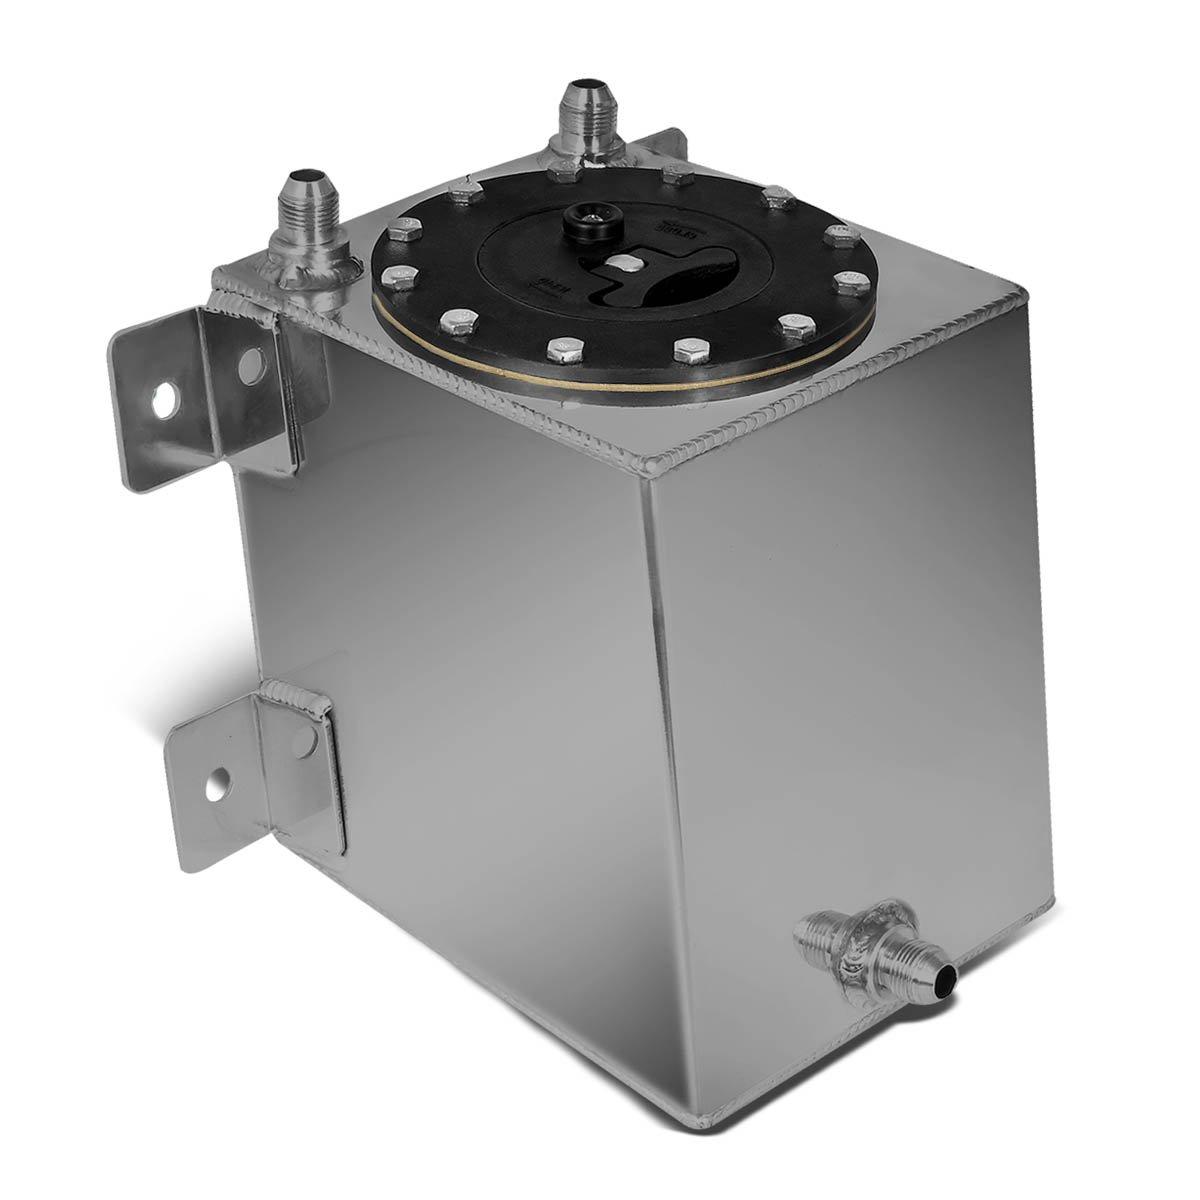 DNAMotoring ALU-FT-B-BF-1G Aluminum Bottom-Feed Fuel Cell Gas Tank, 1 gal DNA Motoring